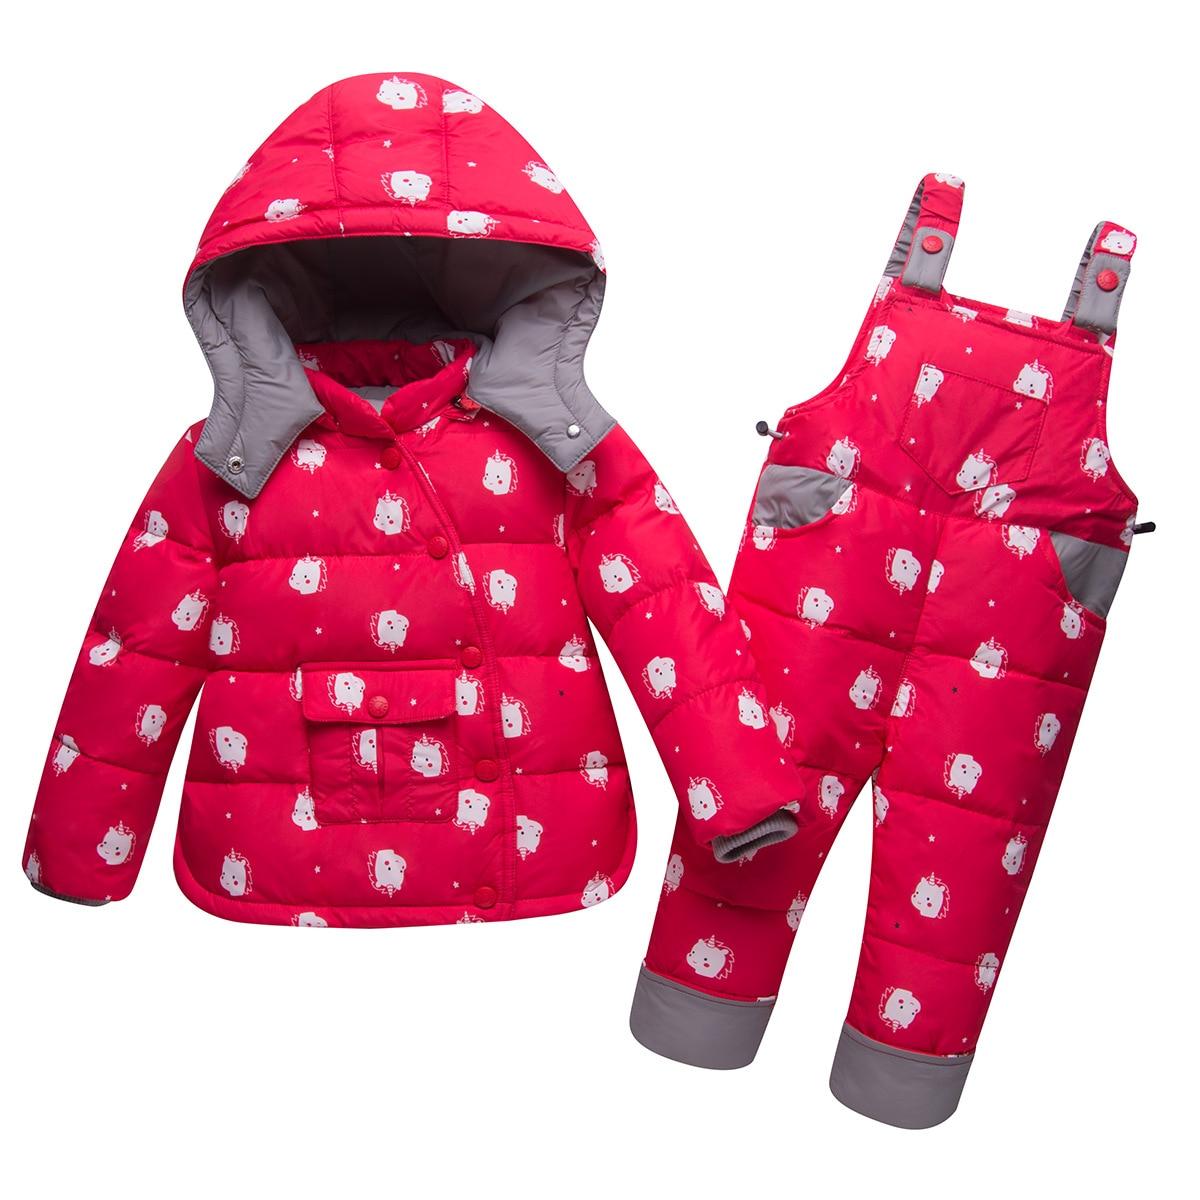 b8a35d8b4 Winter Baby Girls Ski Suit Unicorn Print White Duck Down Snowsuit ...